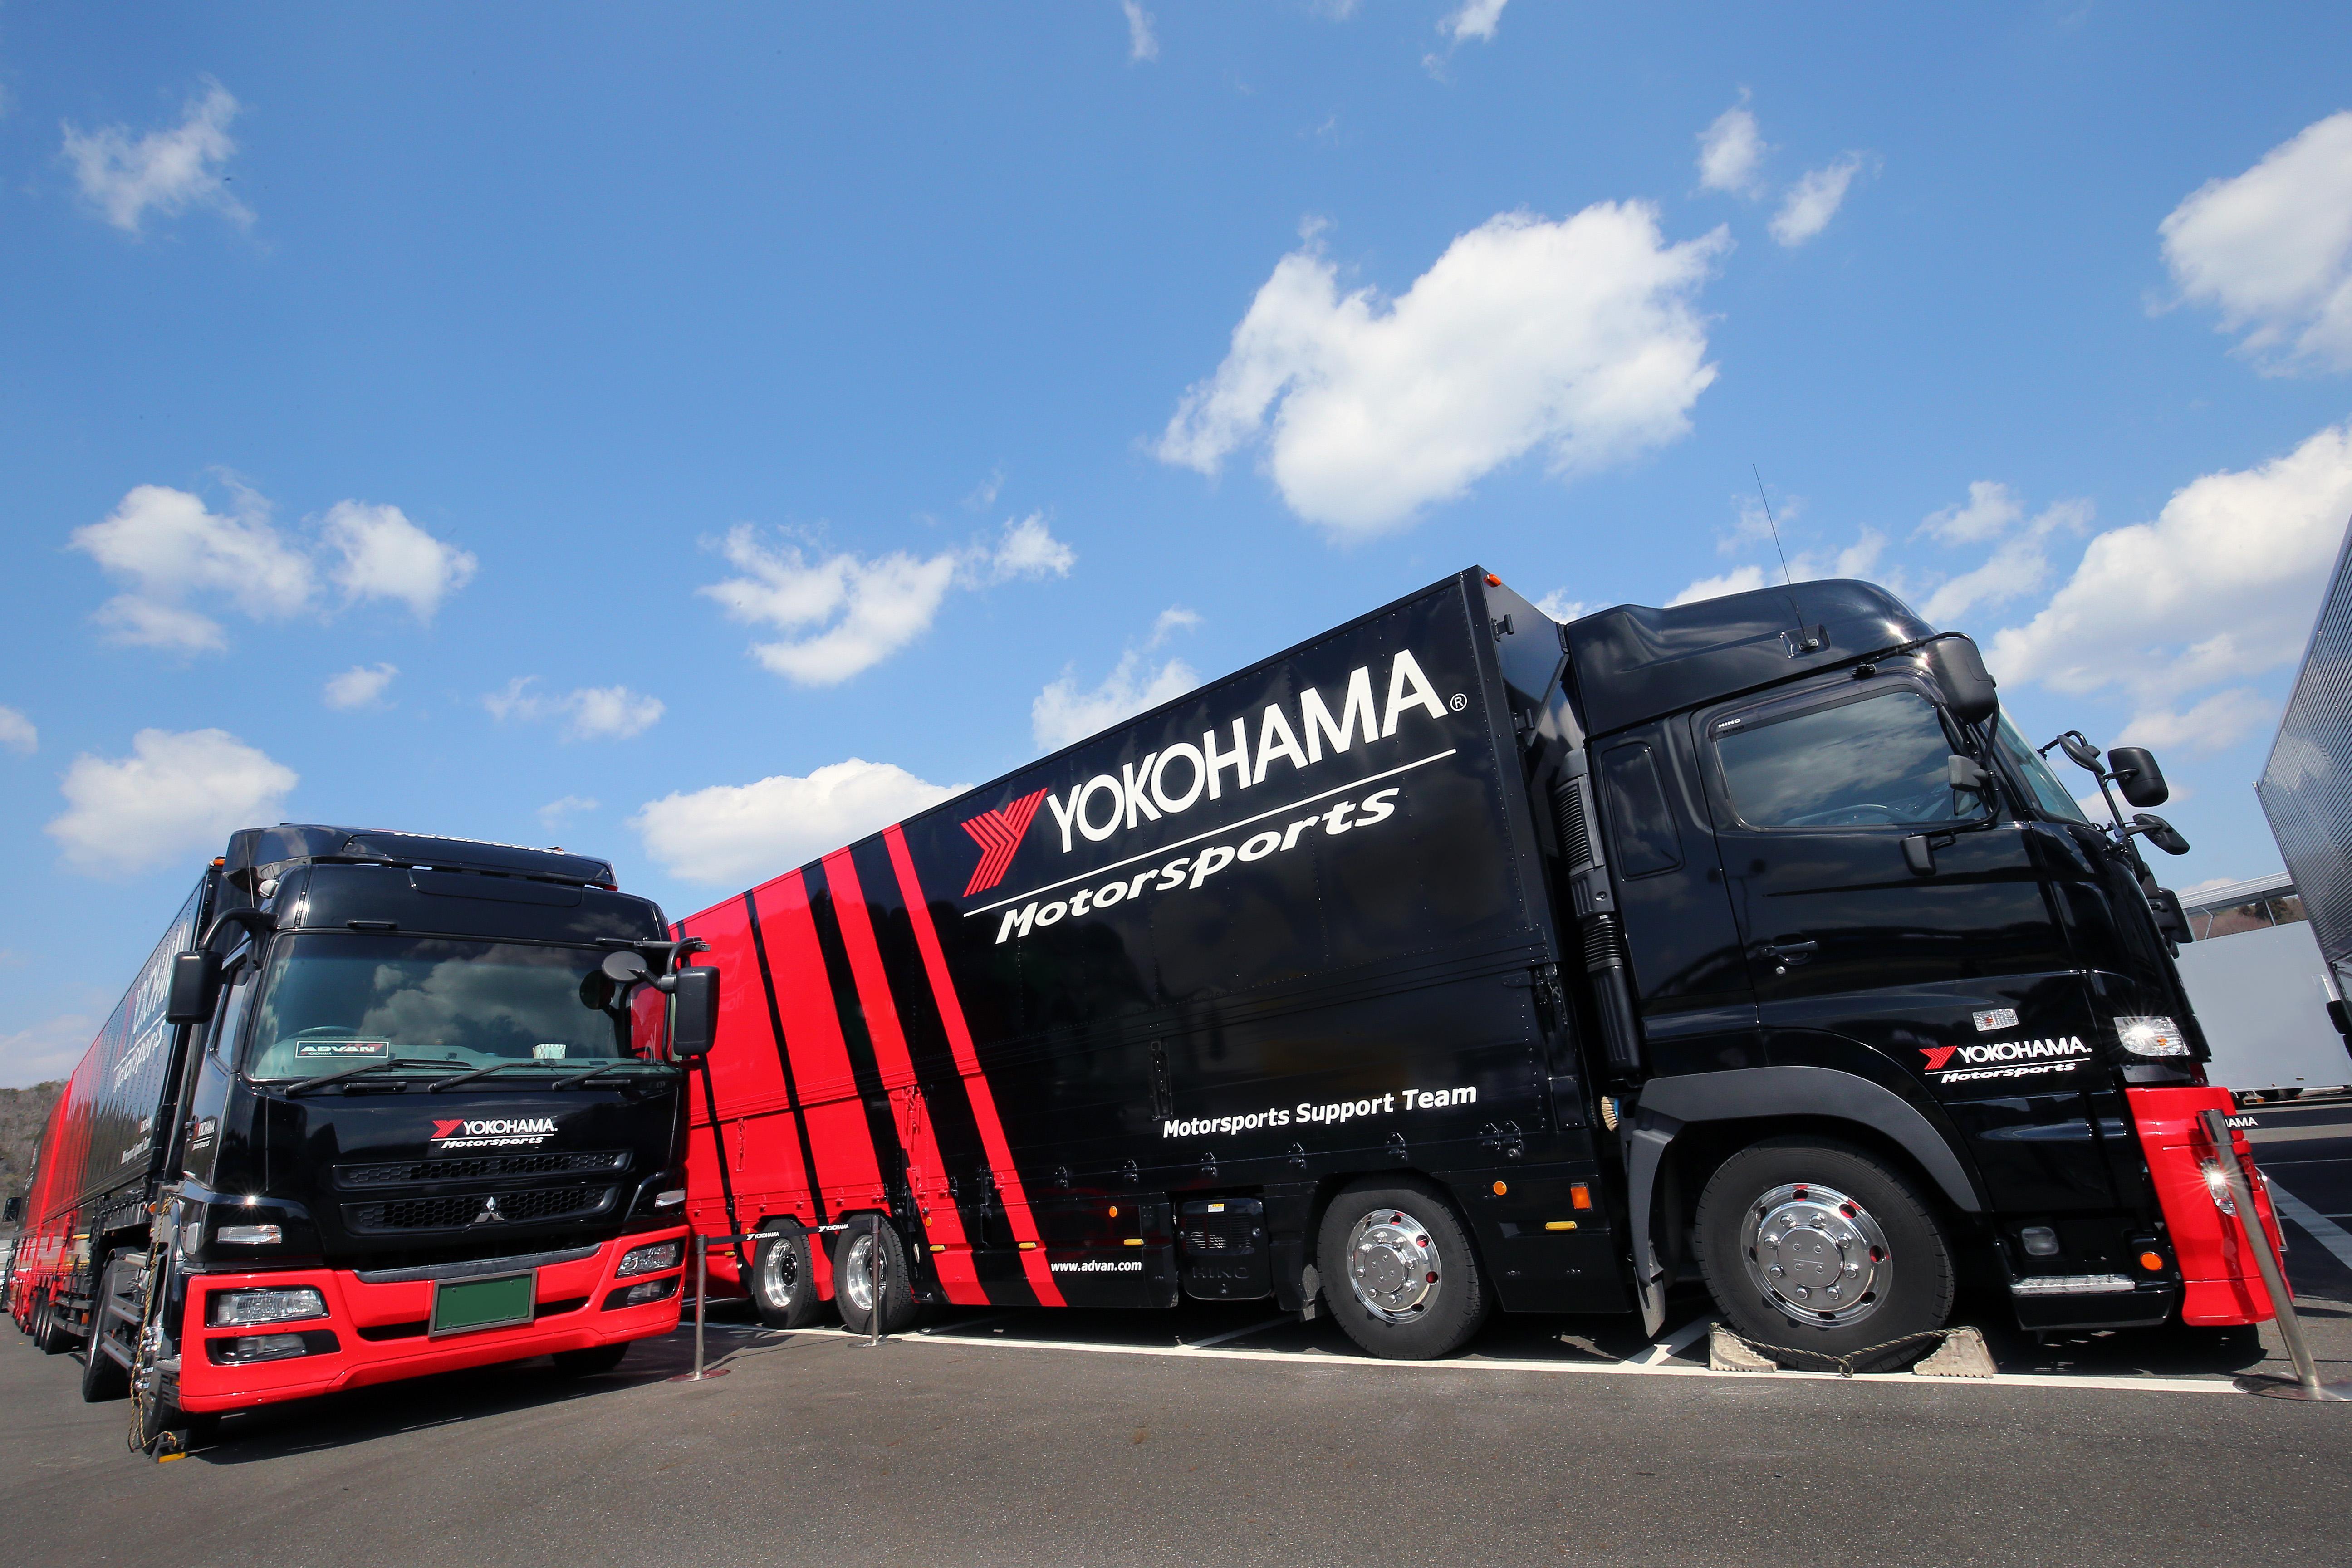 Участники новой серии WTCR 2018 поедут на шинах Yokohama ADVAN